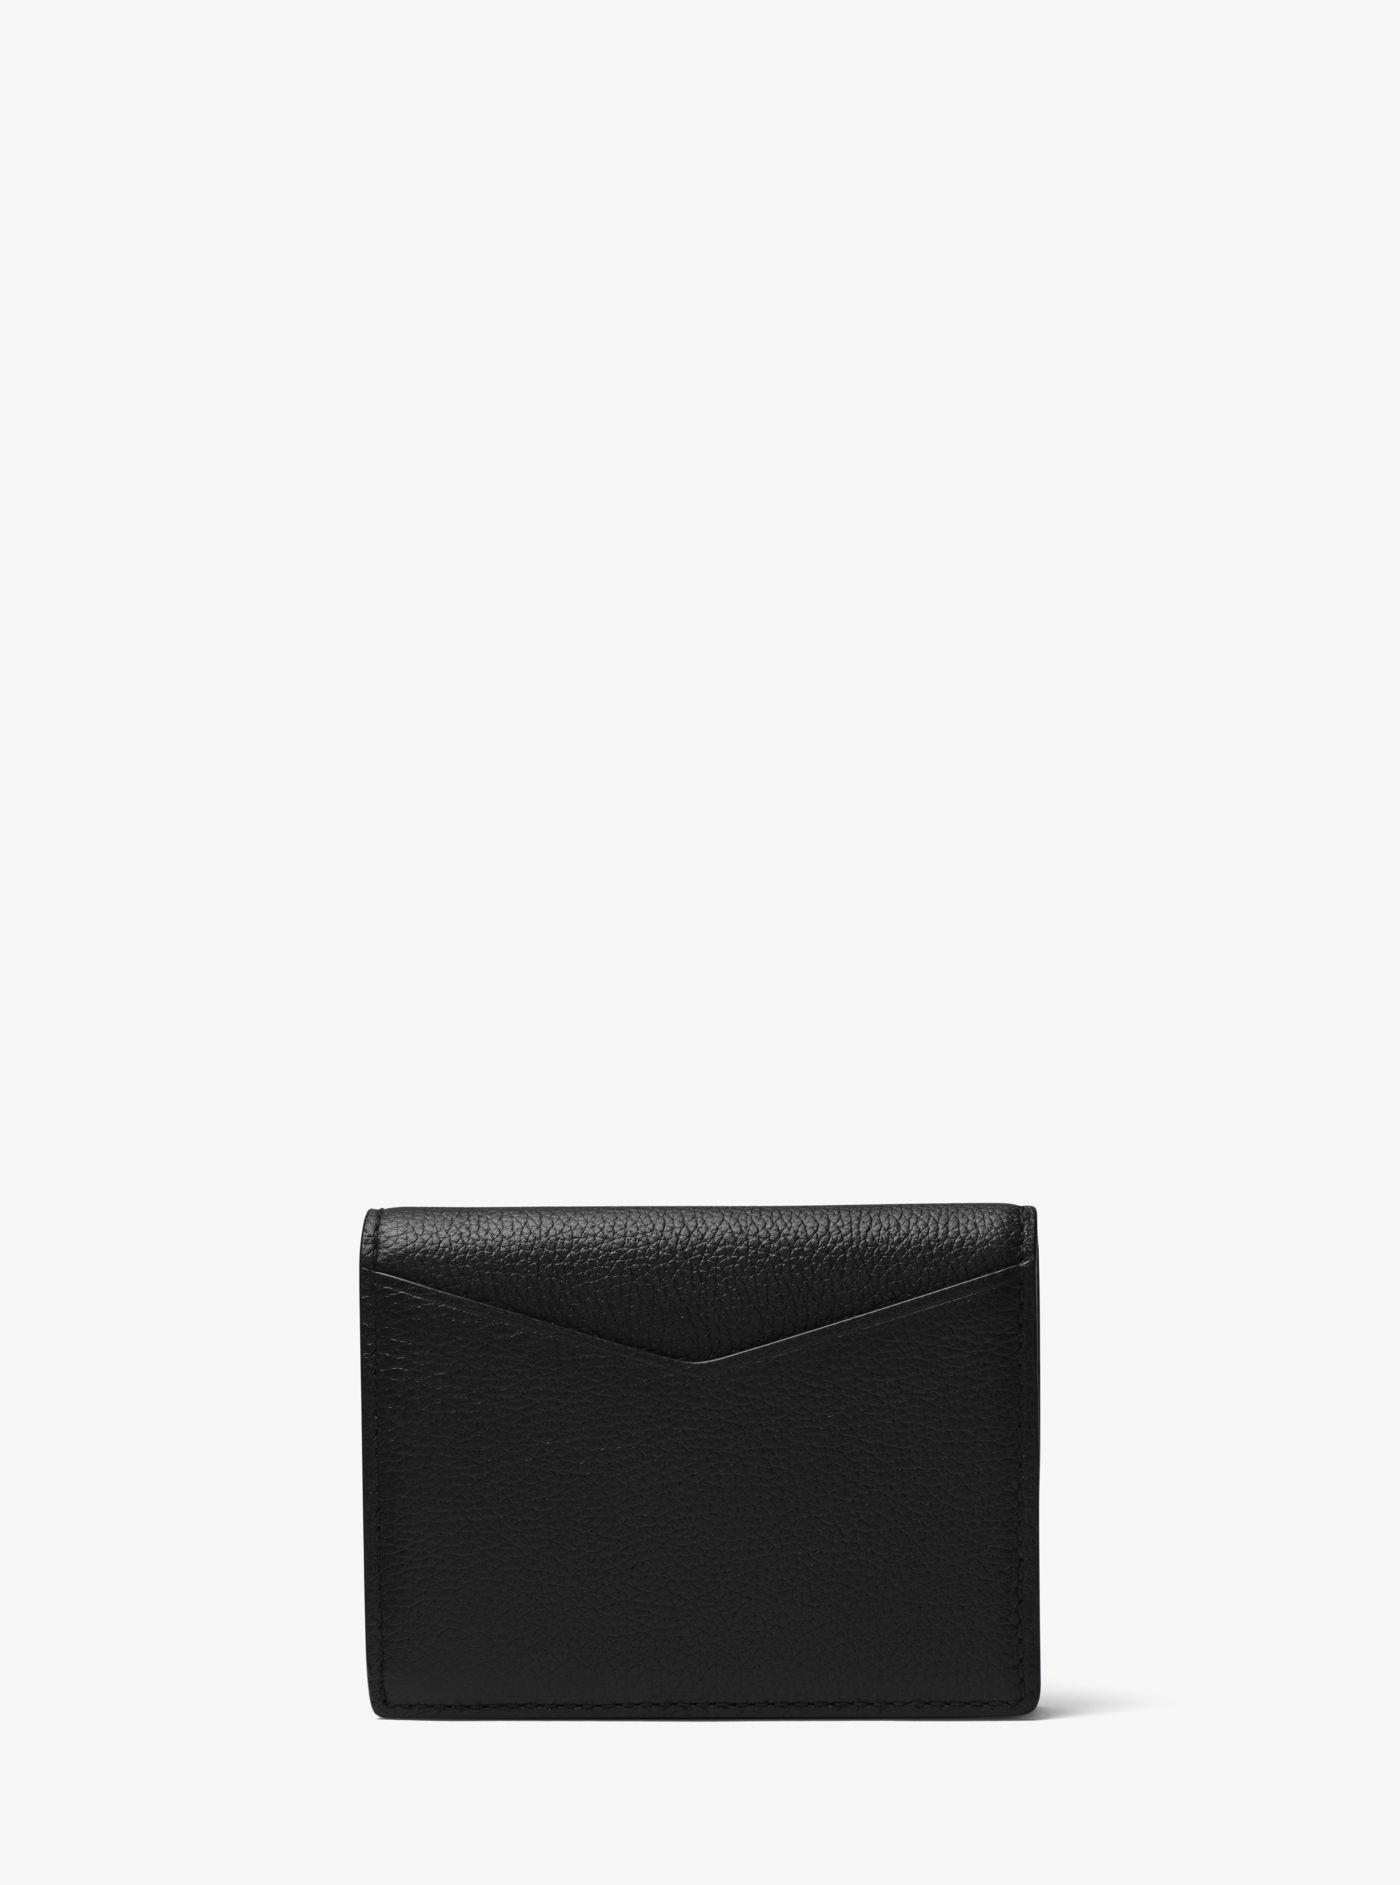 7f53cefe83b42 Lyst - Michael Kors Bryant Leather L-fold Wallet in Black for Men